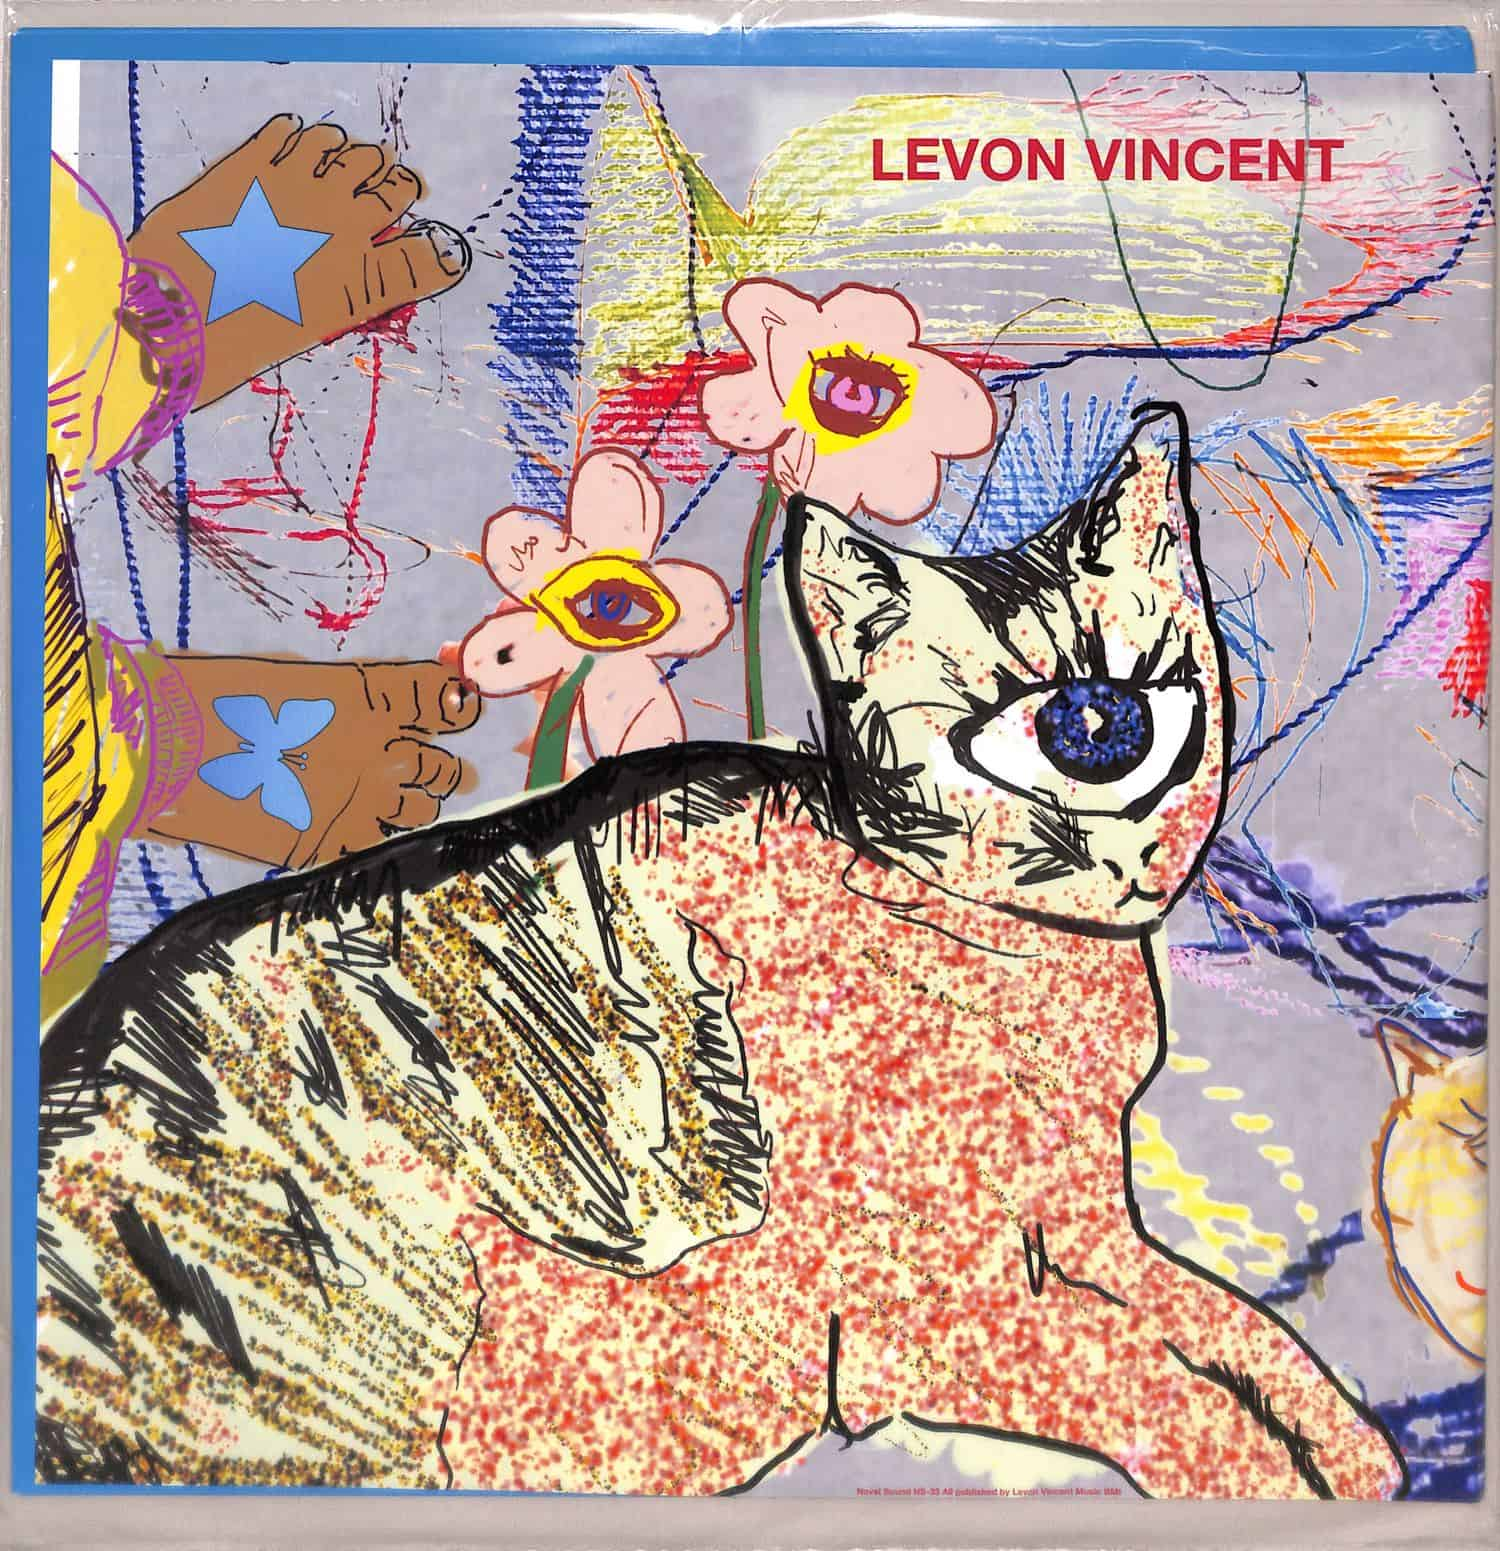 Levon Vincent - CYCLOPS TRACK